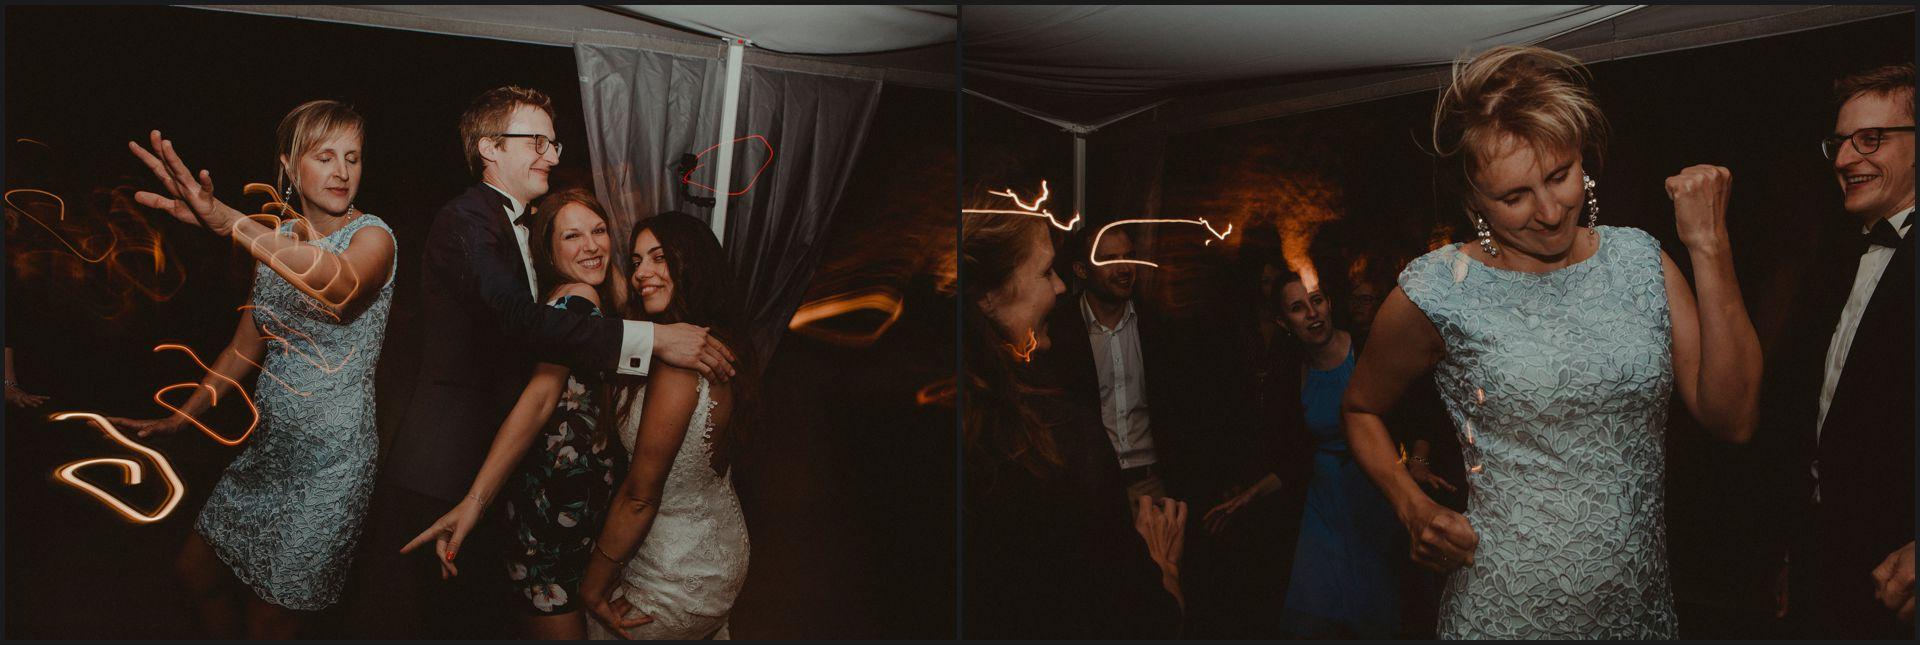 first dance, bride, groom, wedding, umbria, nikis resort, dance, funny